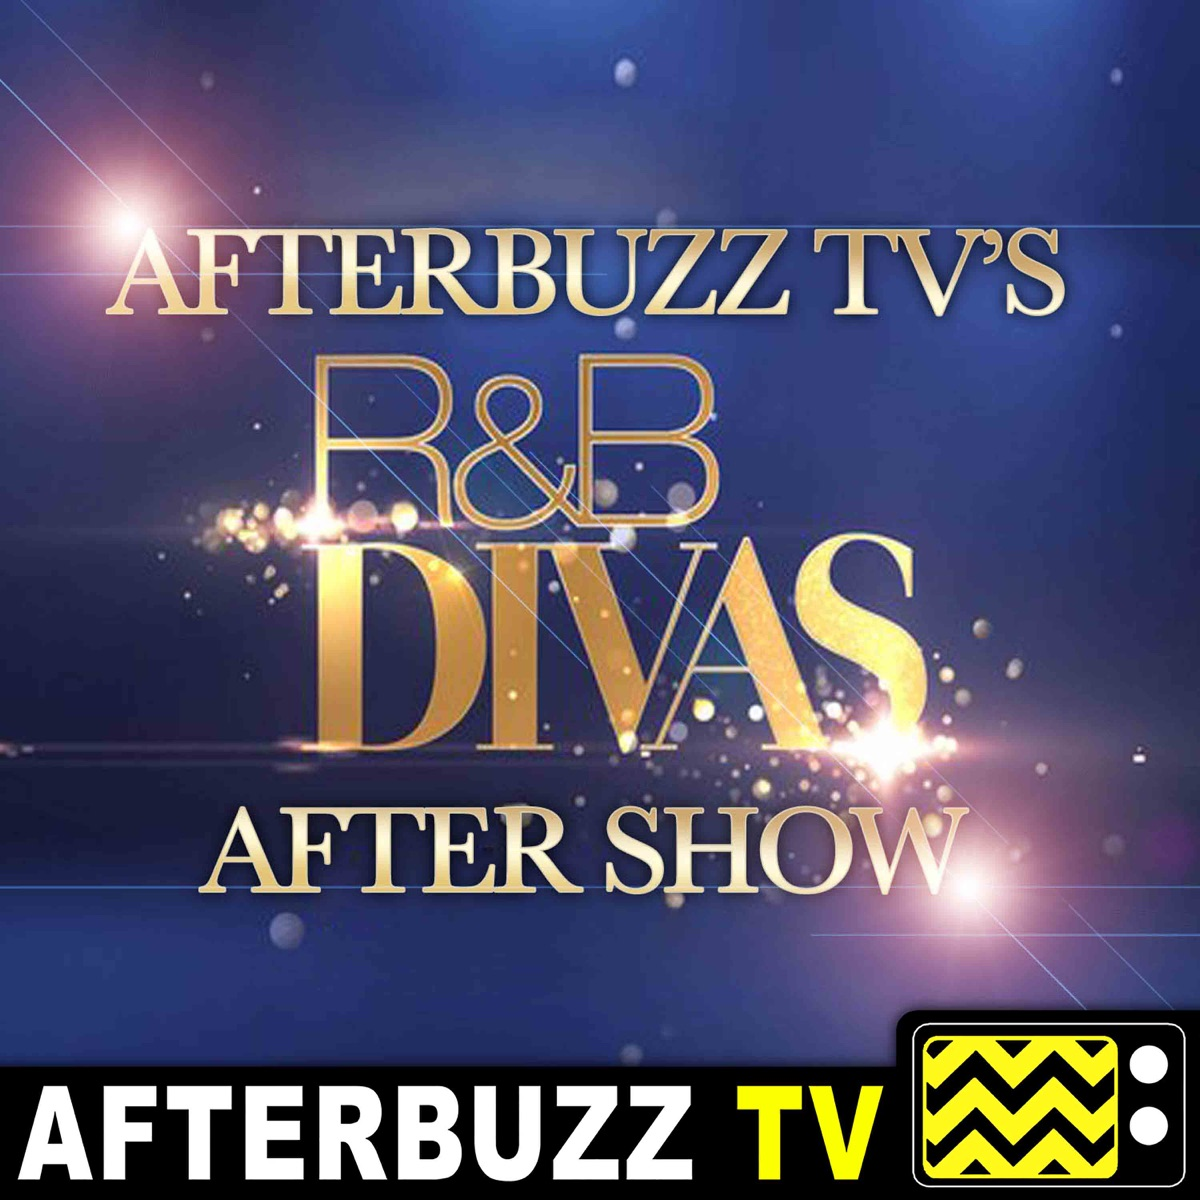 R&B Divas Reviews and After Show